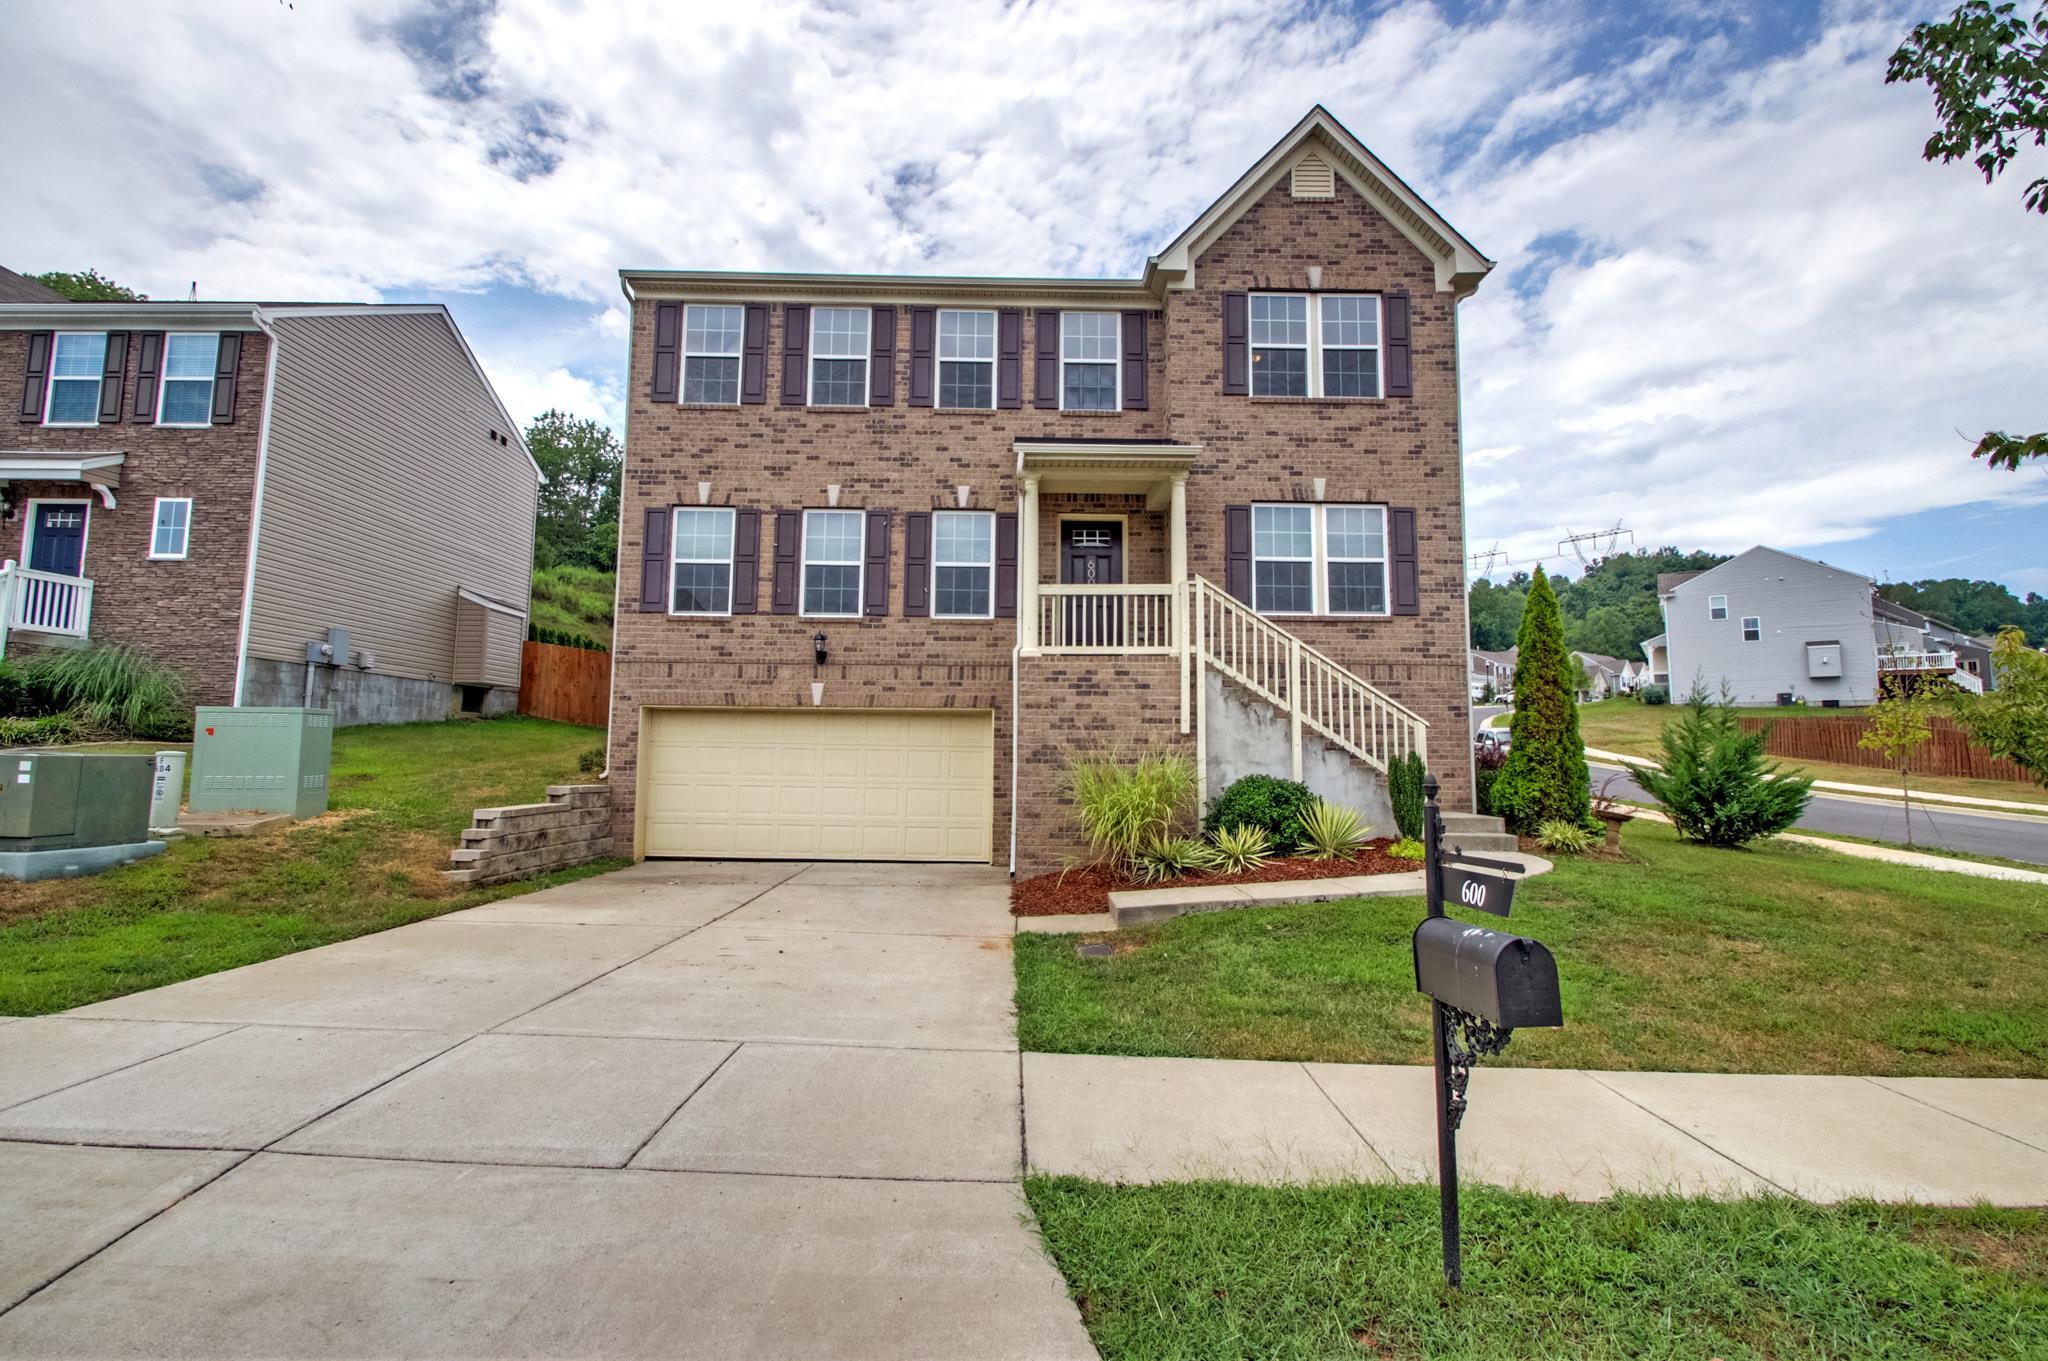 600 Wolfeboro Ln, Bellevue in Davidson County County, TN 37221 Home for Sale